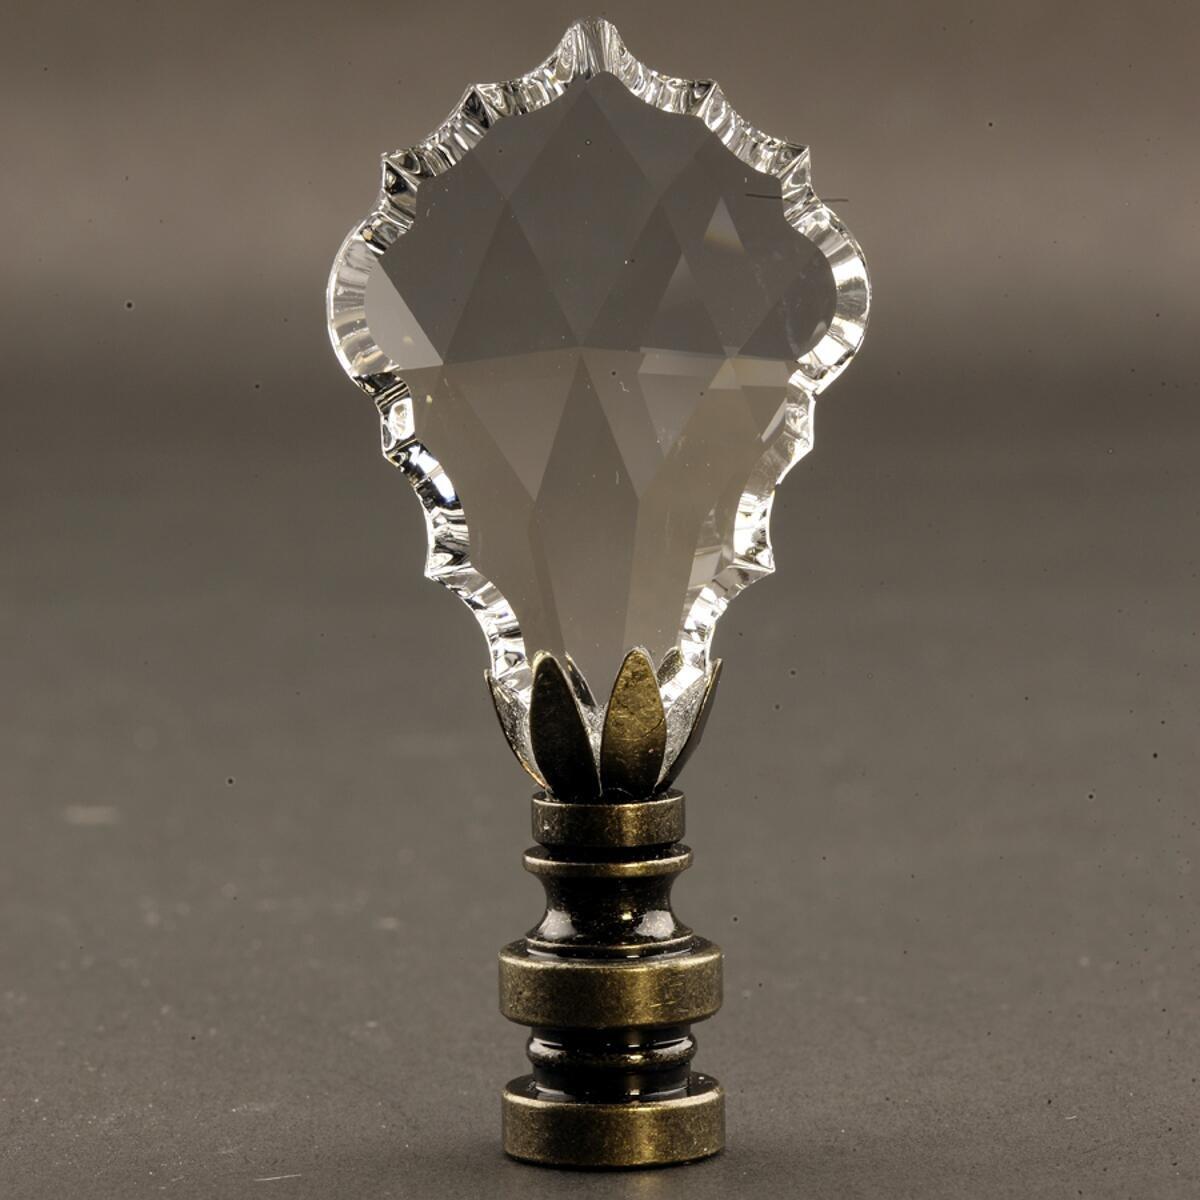 Swarovski Crystal Gothic Cross Antique Base Finial 2.75'' h